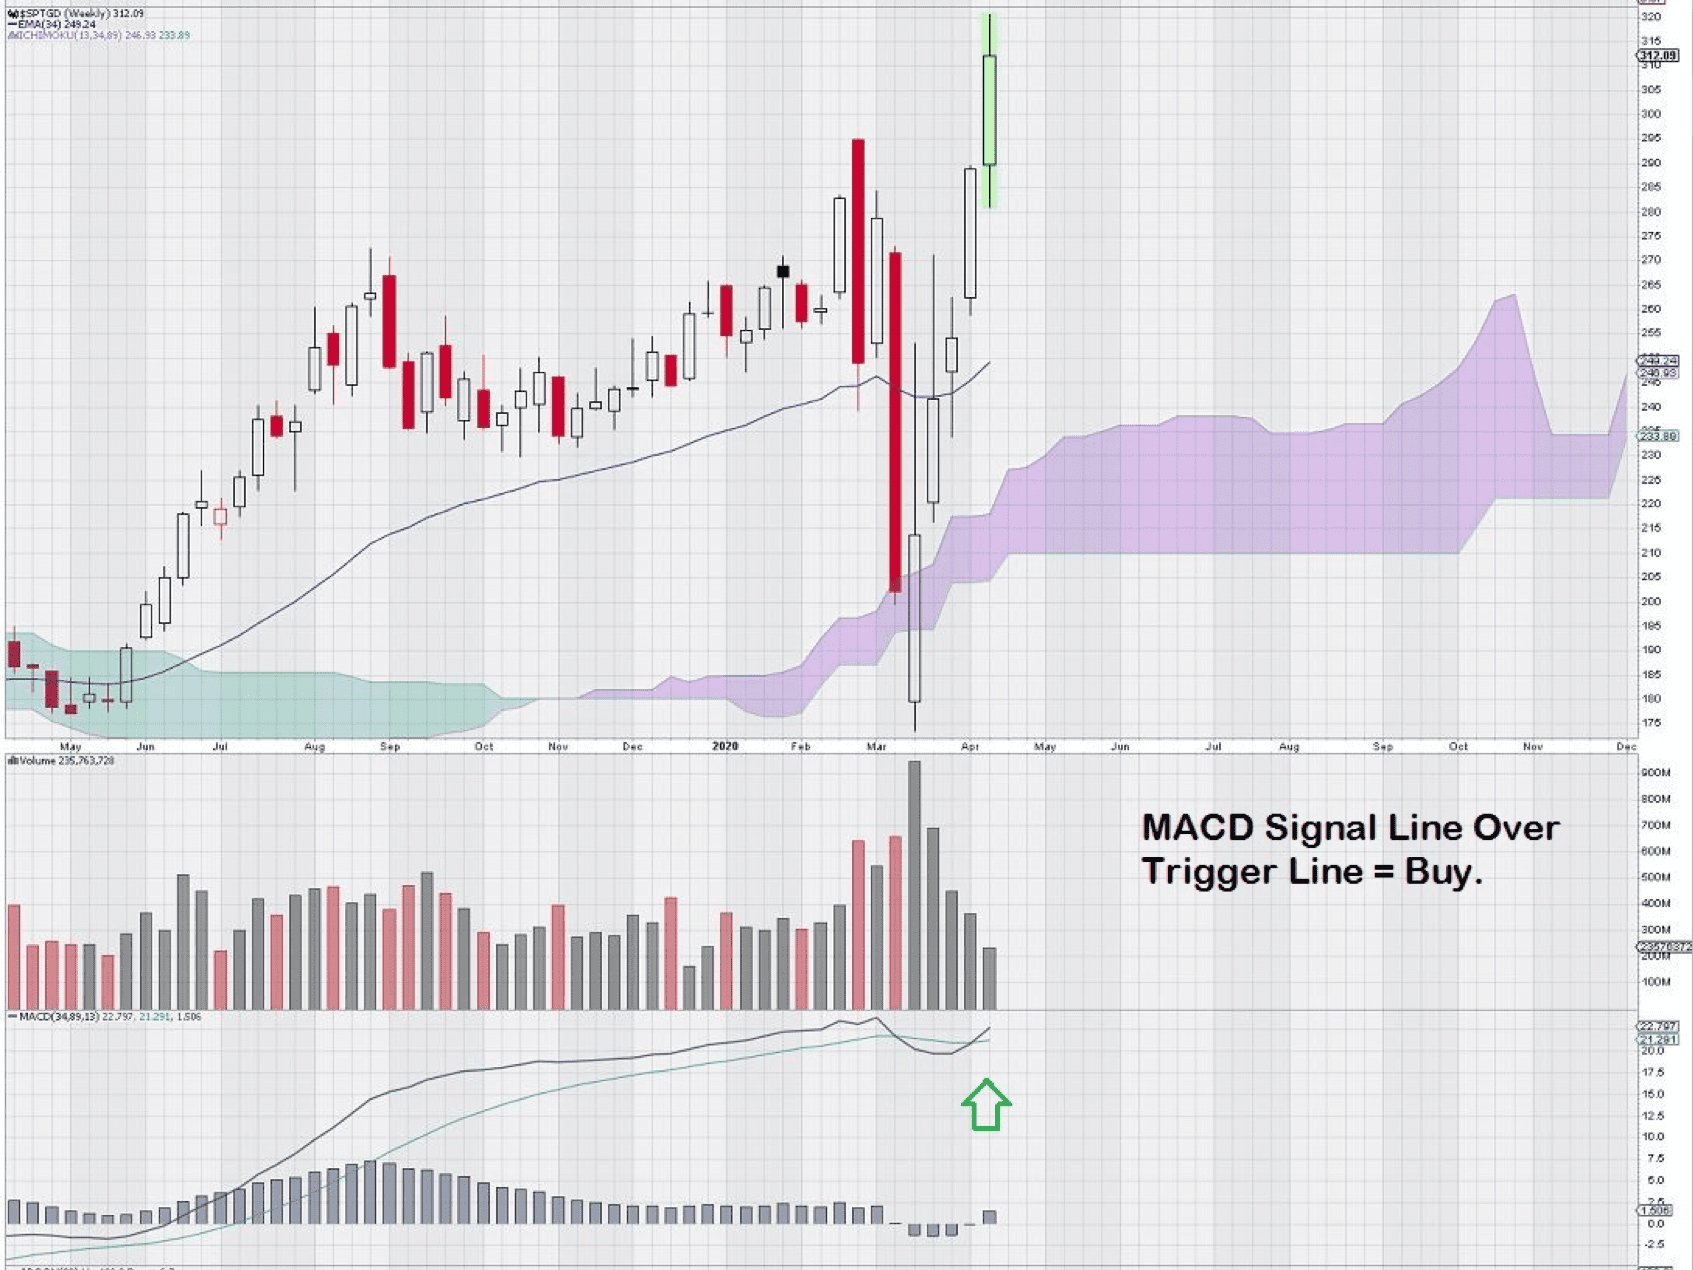 MACD signal line over trigger line on TSX Global Gold Index